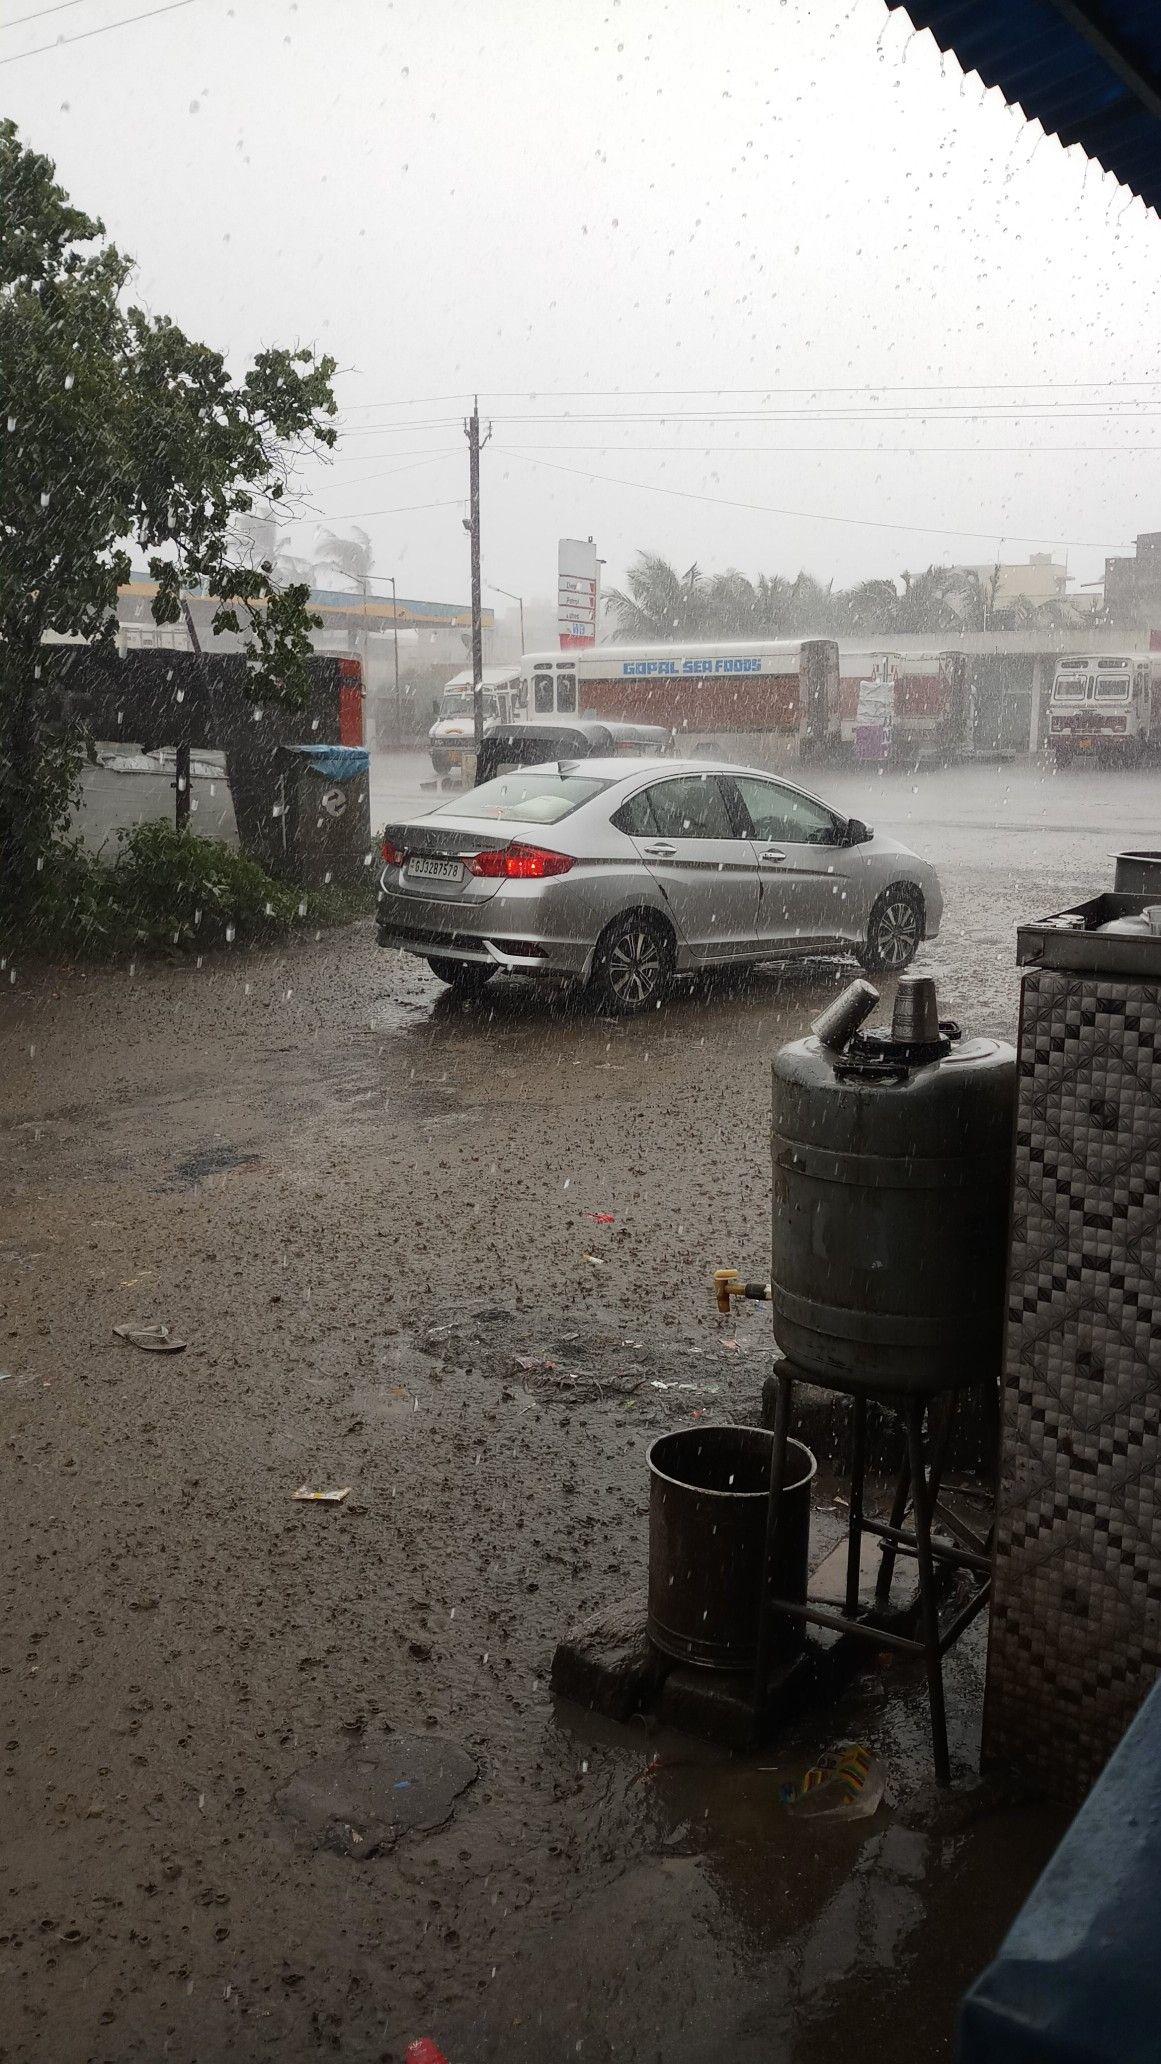 rain 💓 Iphone wallpaper music, Iphone wallpaper, Cars